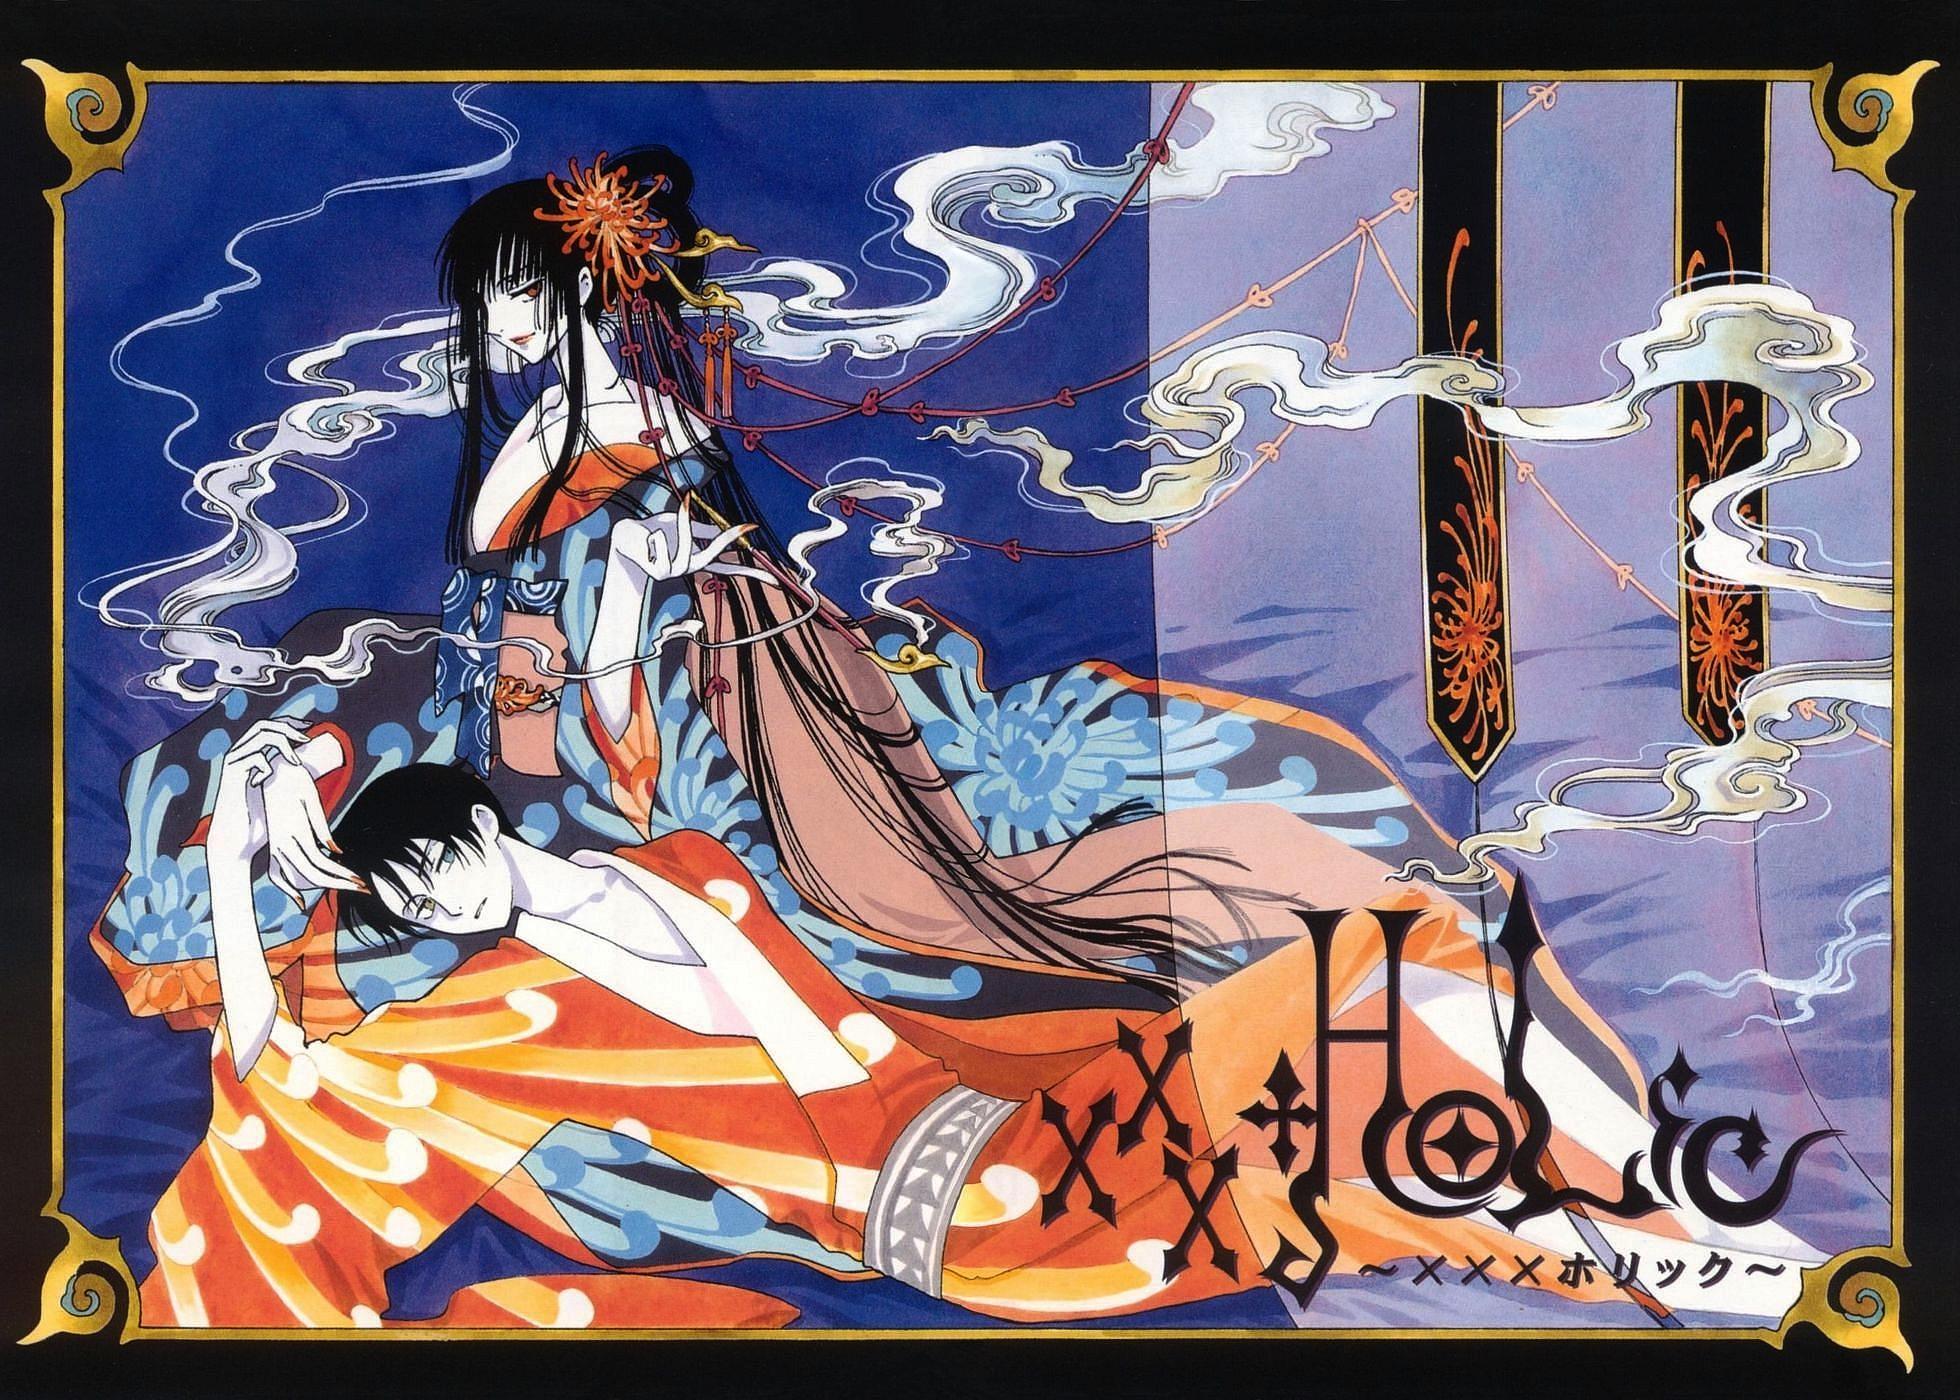 XXX Holic 1826341